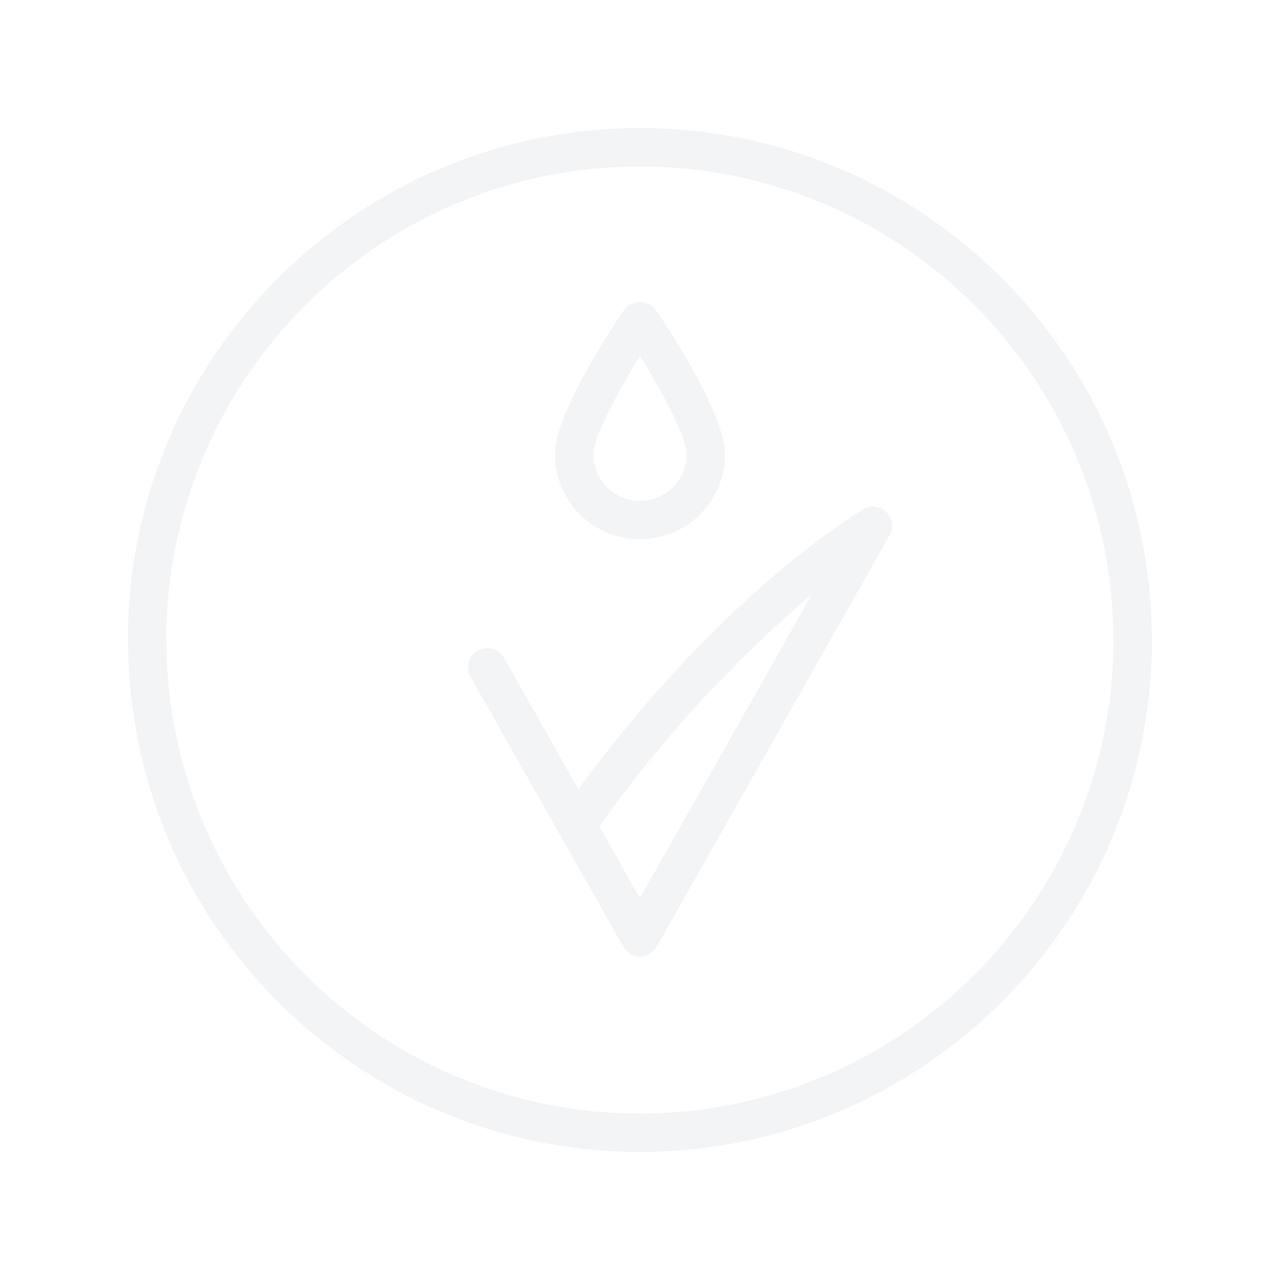 HOLIKA HOLIKA Magic Pole Long & Curl 2X Mascara Black 9ml